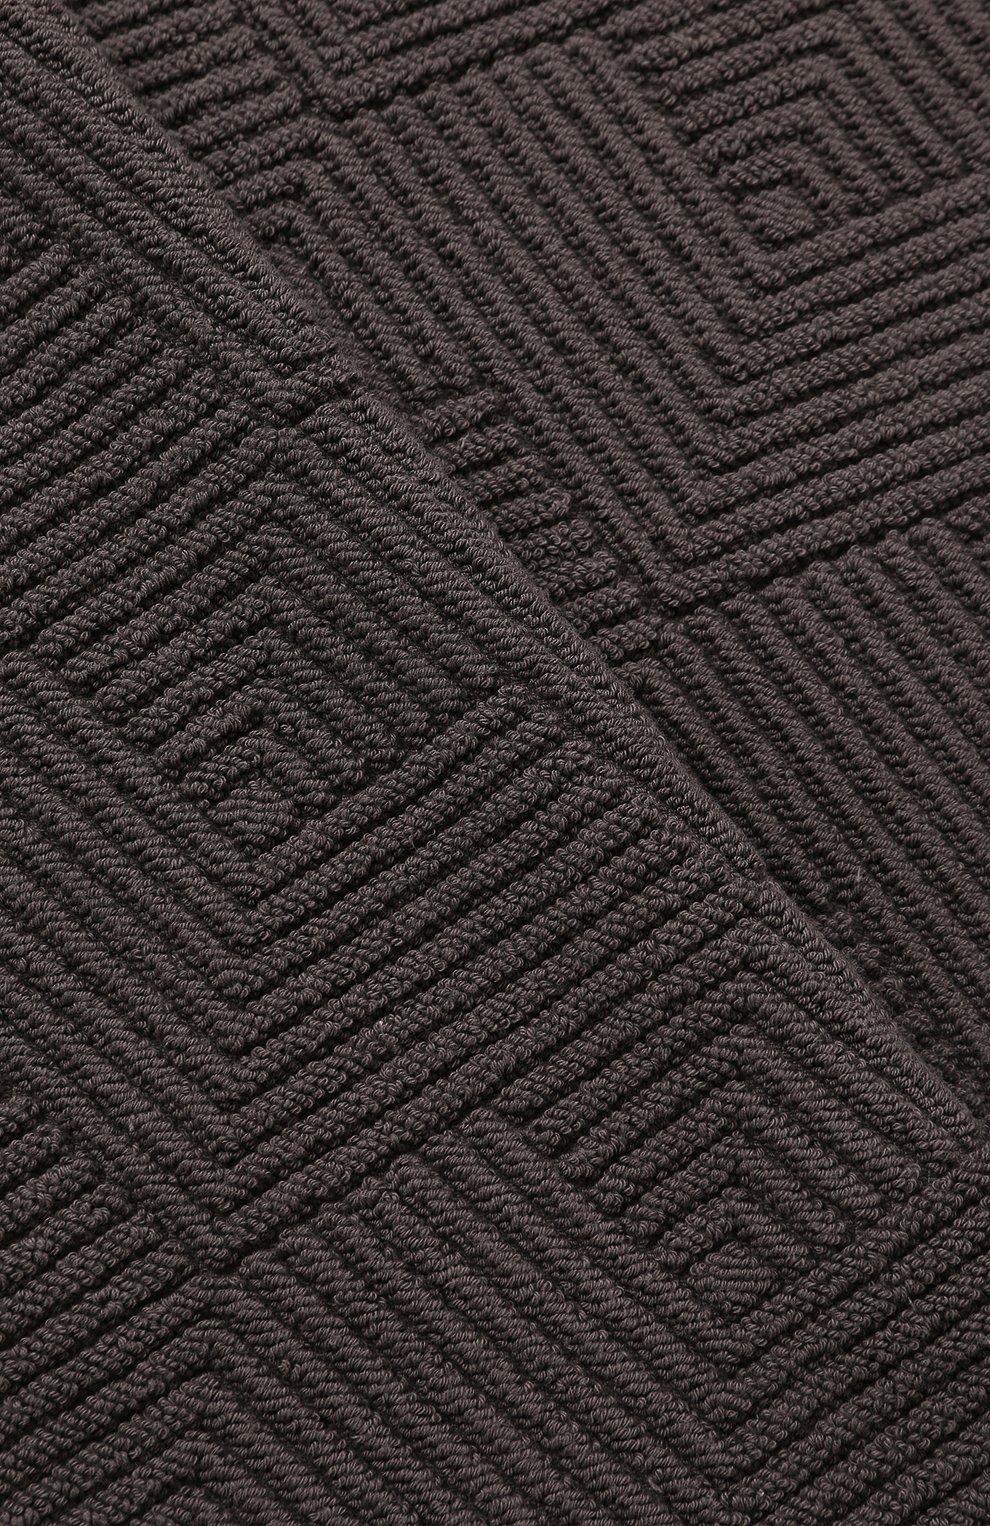 Мужского коврик для ванной комнаты FRETTE серого цвета, арт. FR6243 D0400 060E | Фото 3